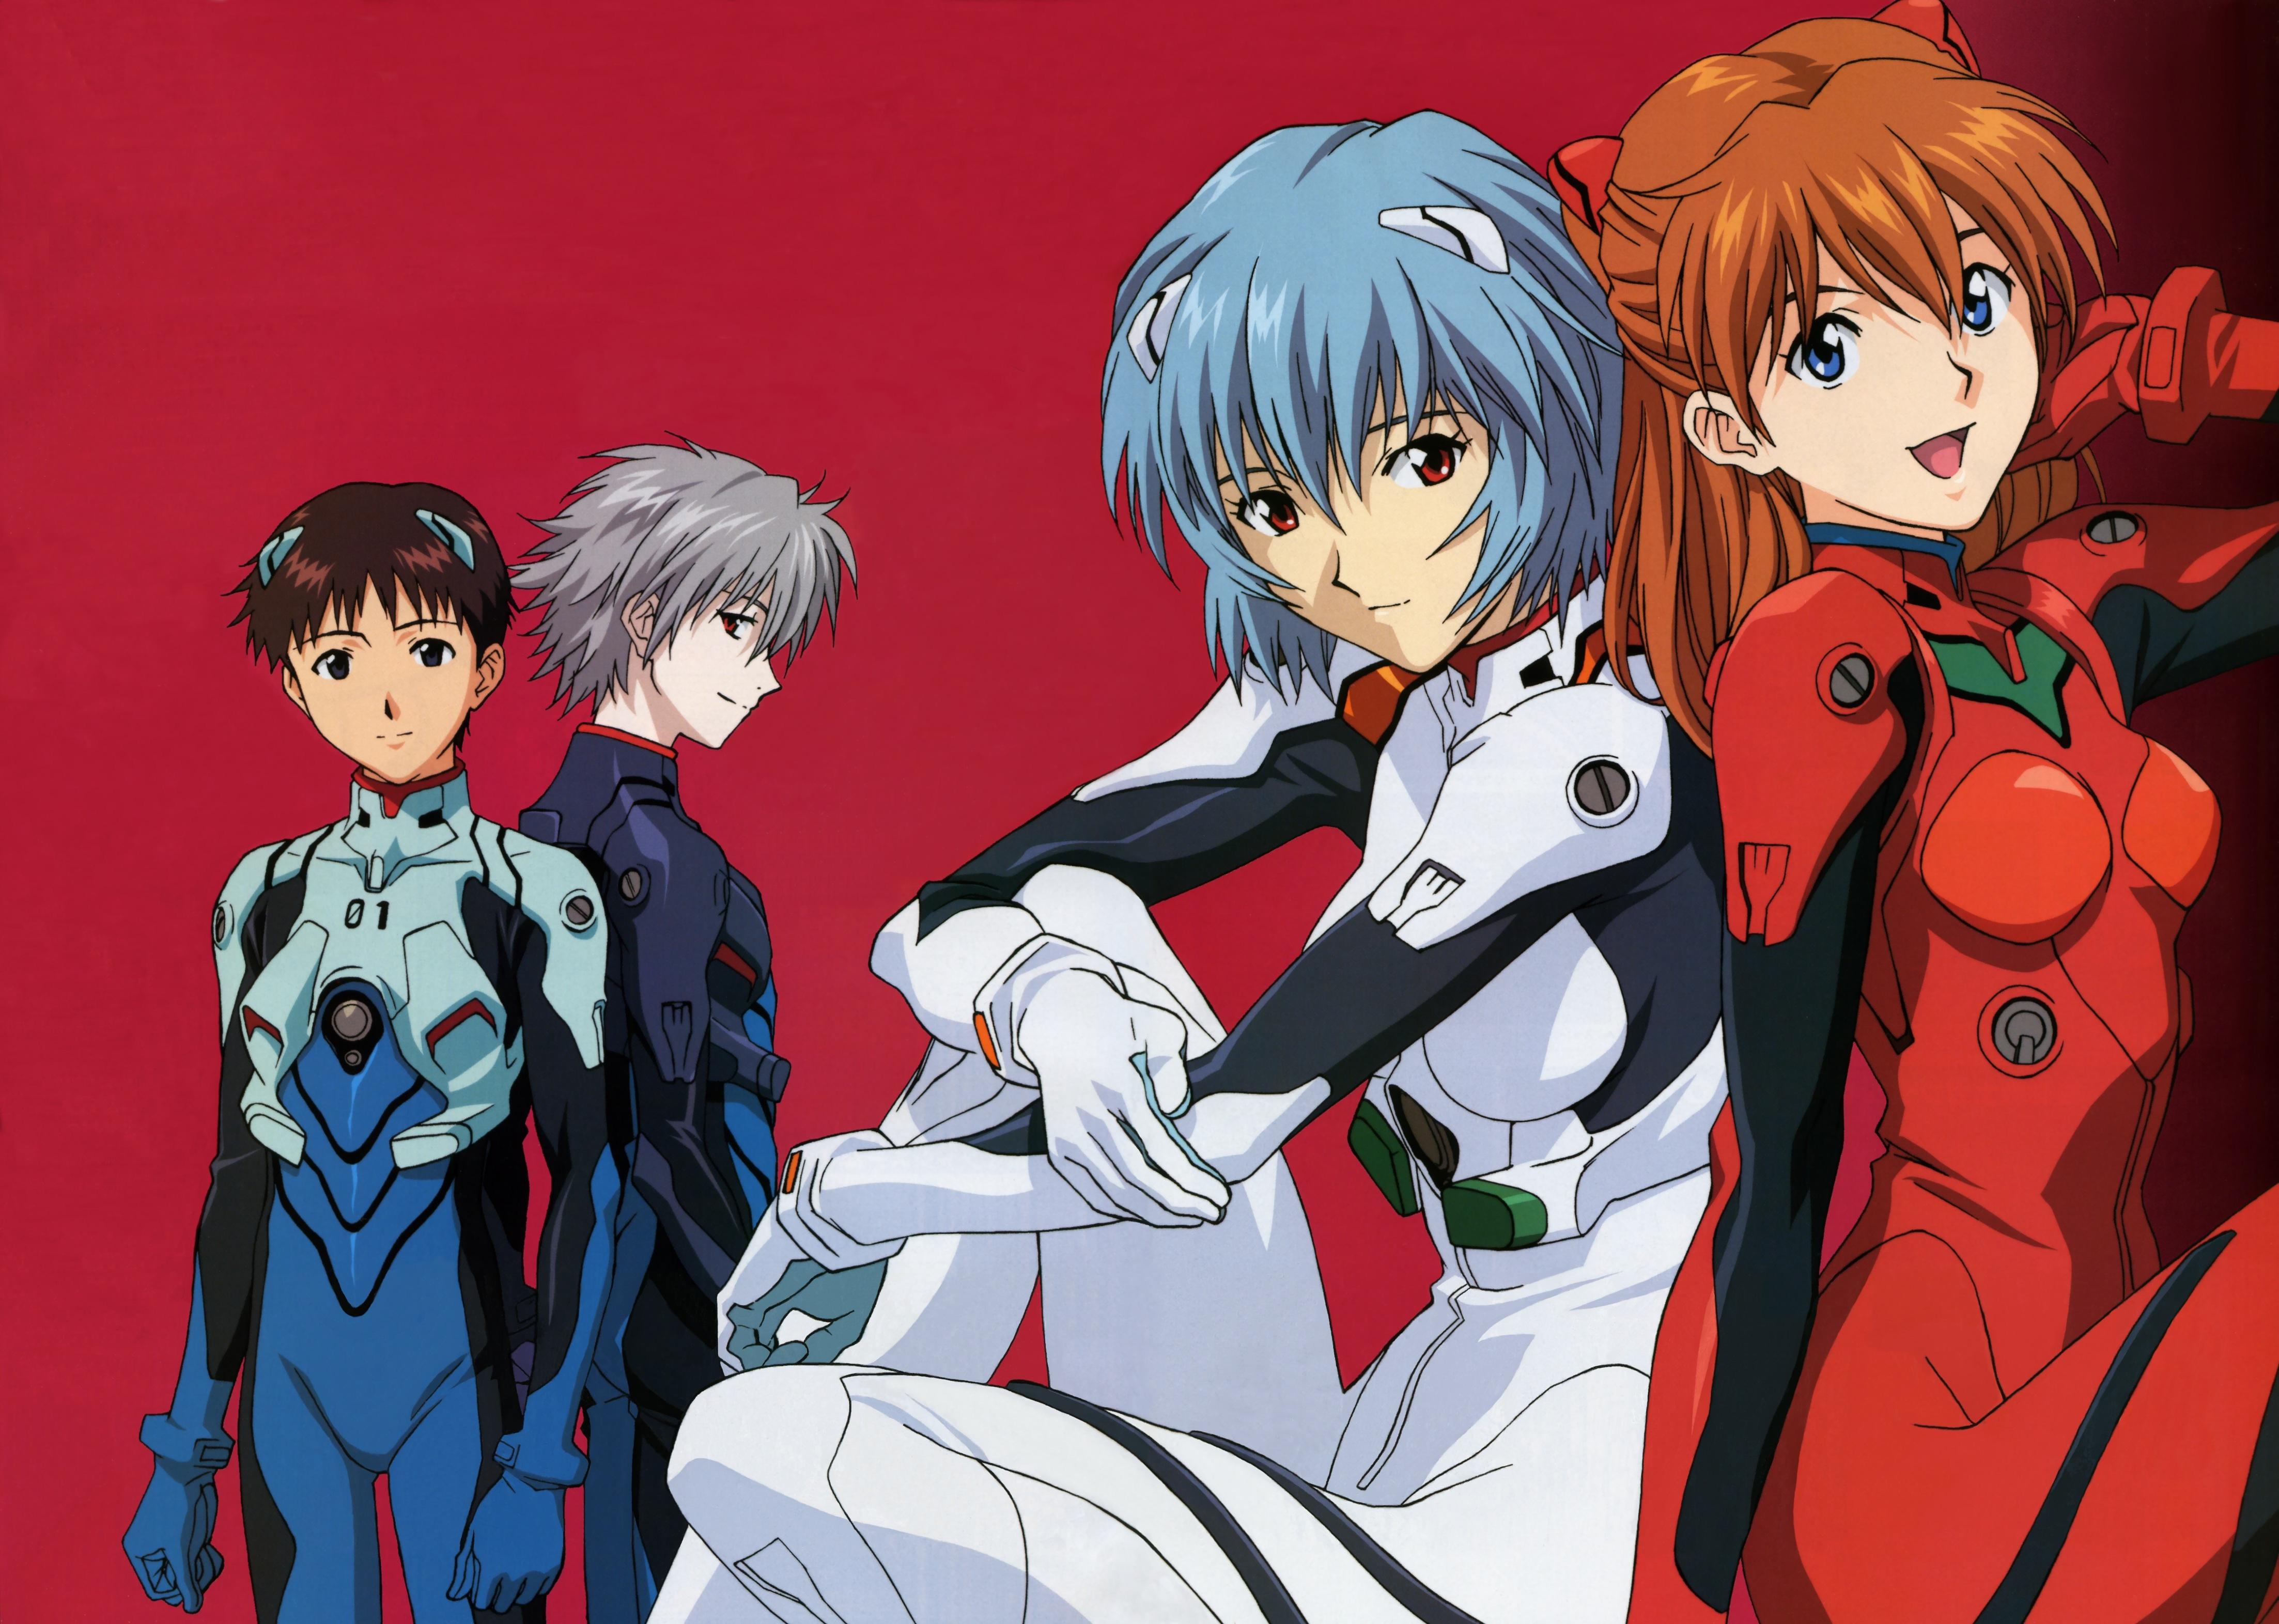 Tags Anime Matsubara Hidenori Gainax Neon Genesis Evangelion Nagisa Kaworu